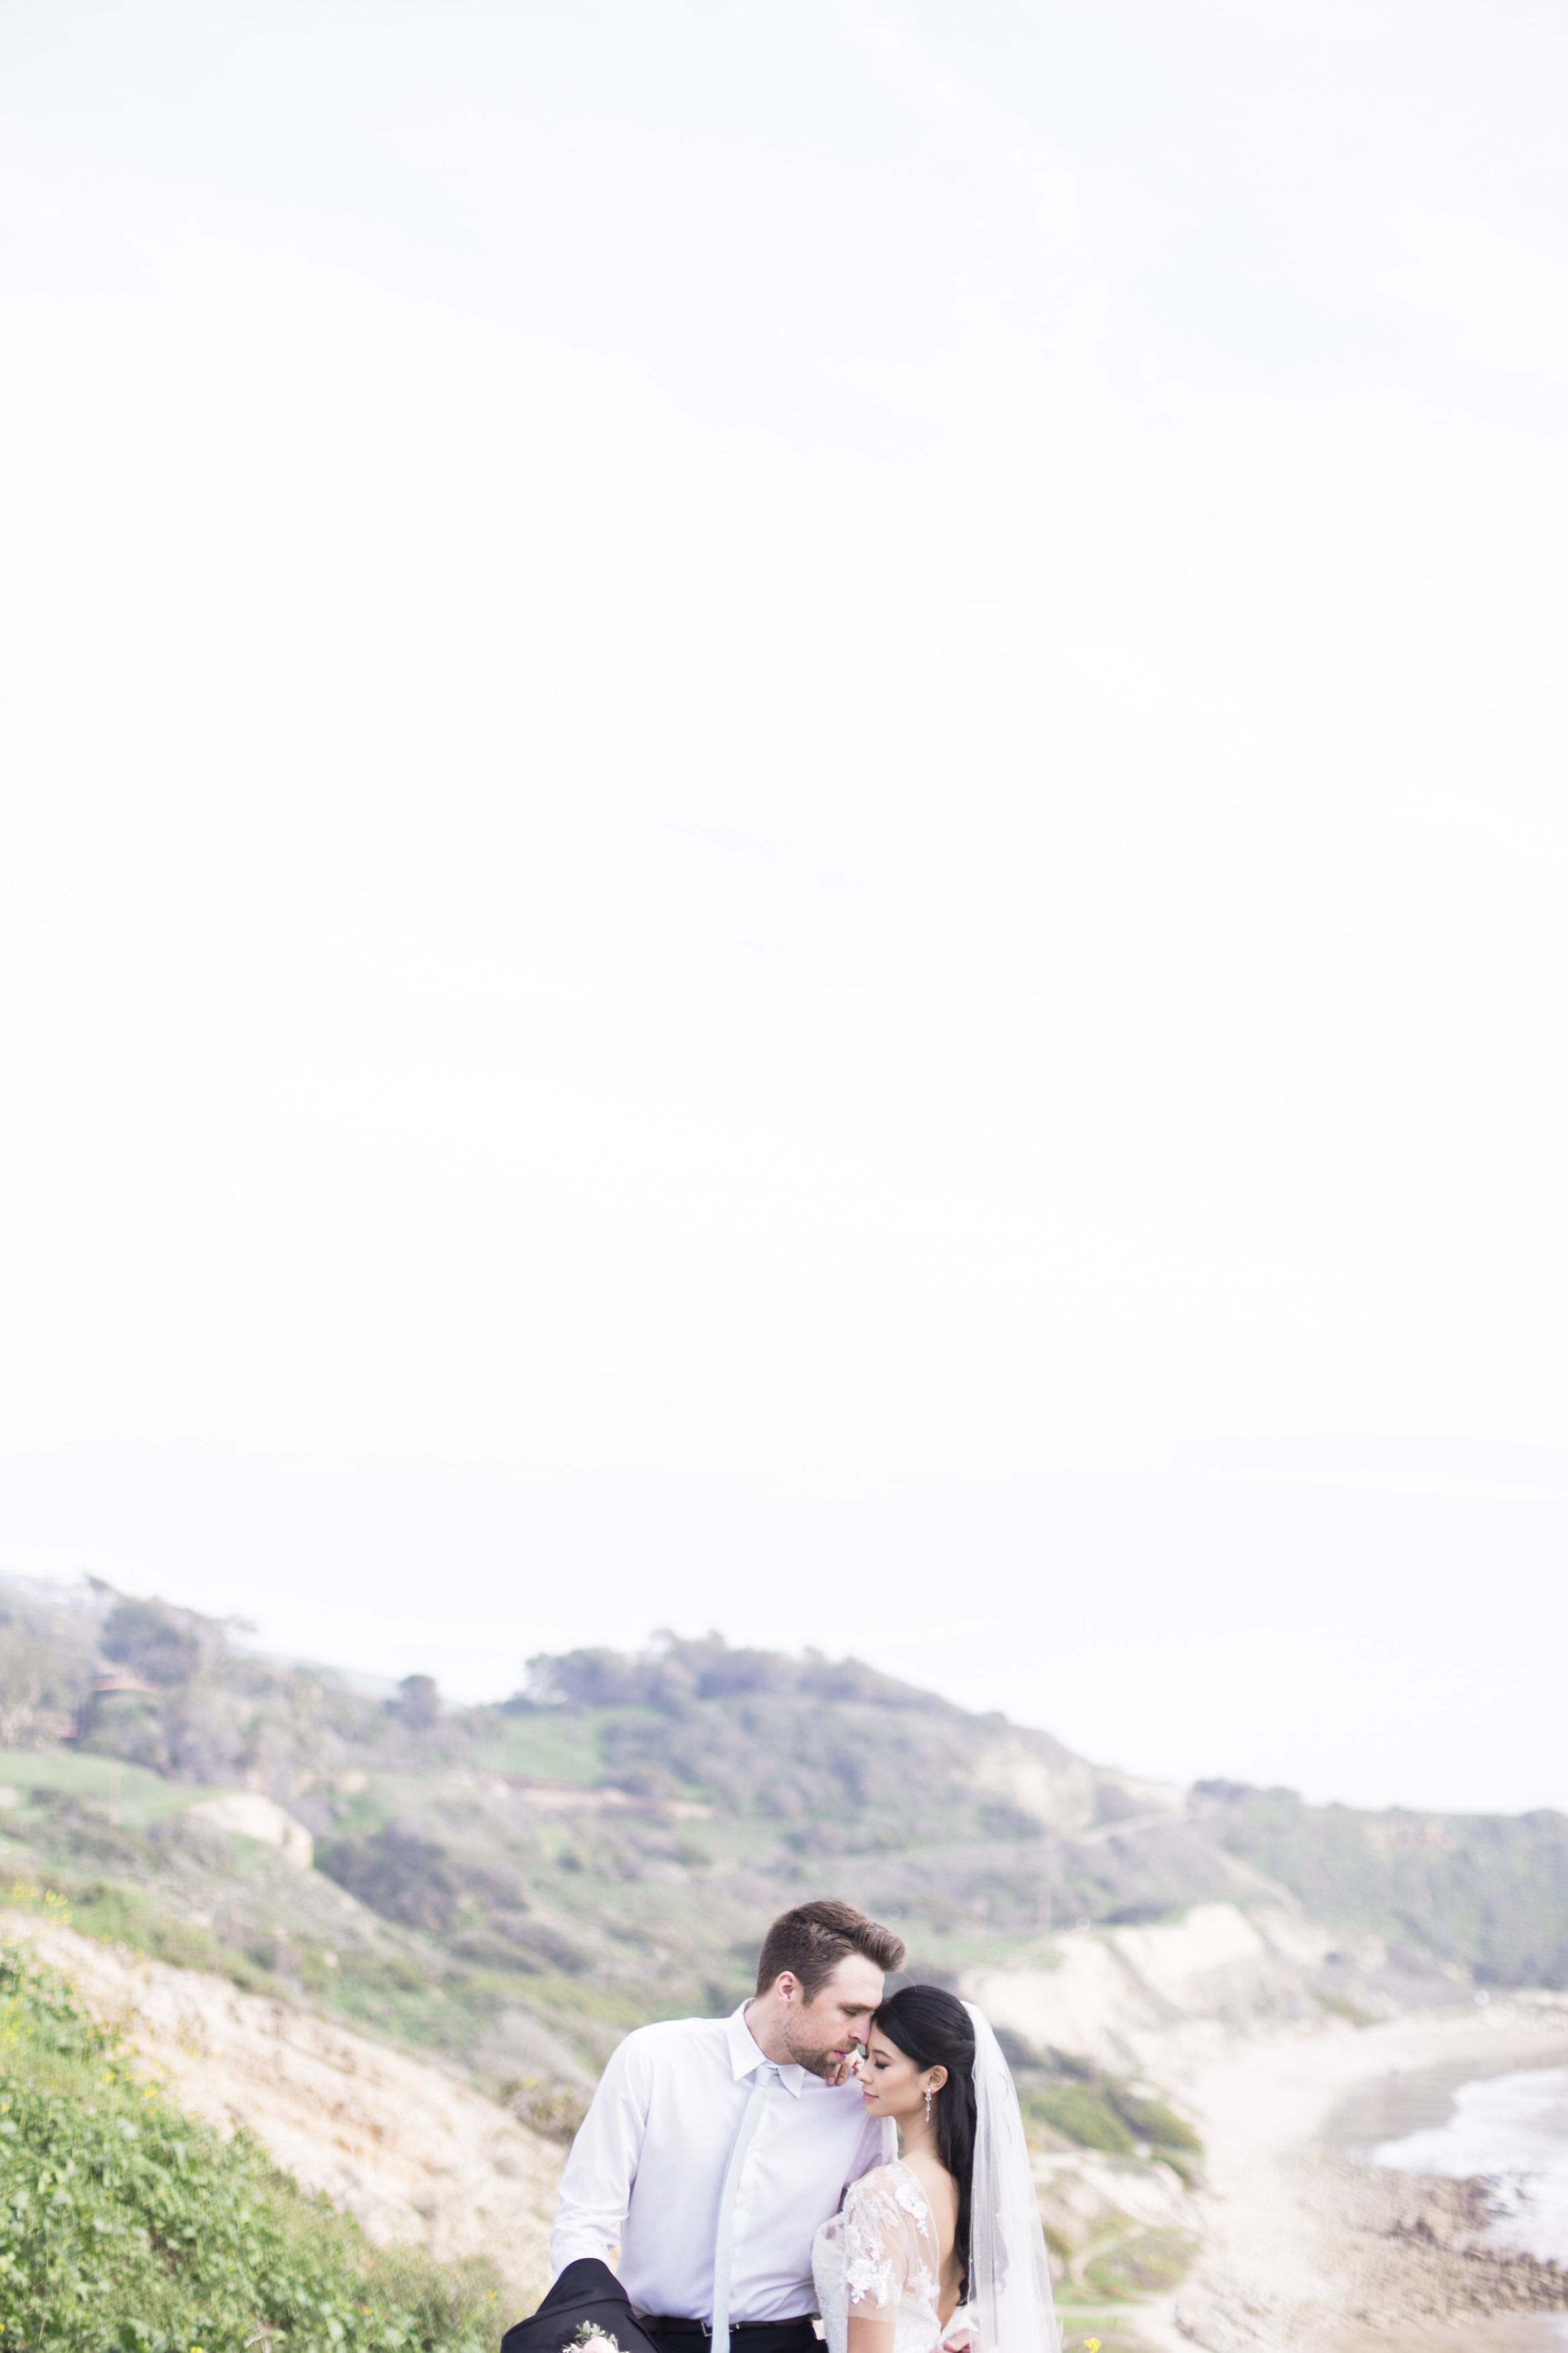 ReverieSupply_CatandChris_Wedding-181.jpg